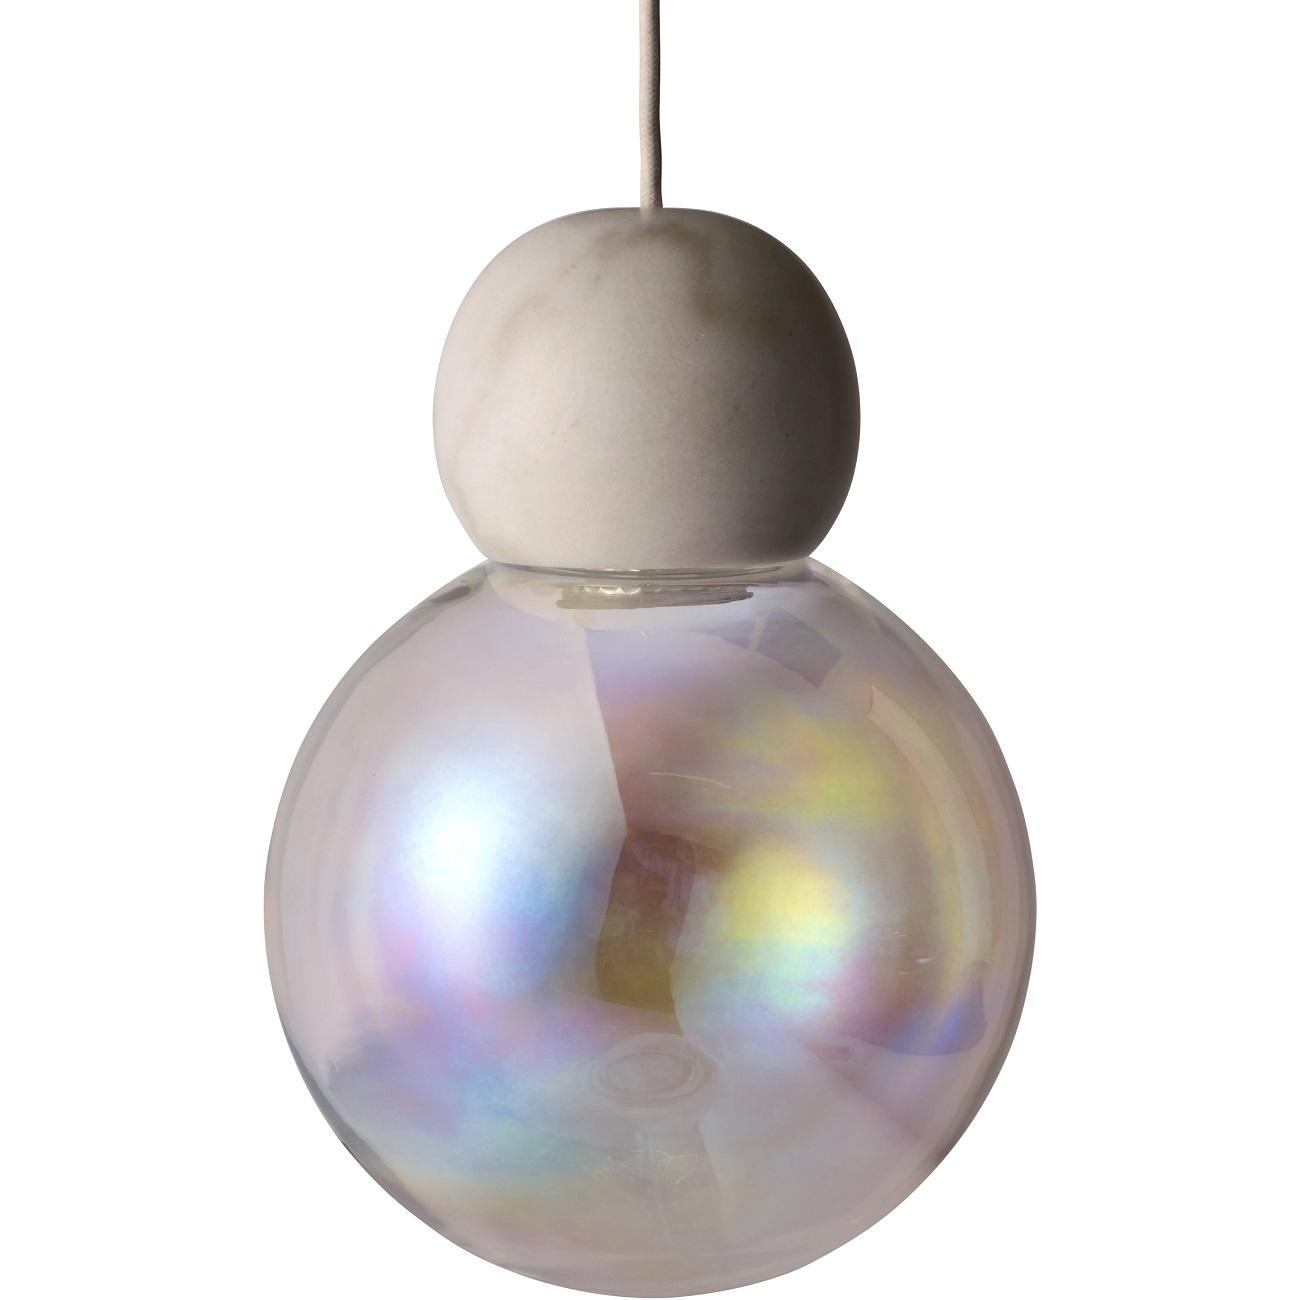 Bolia designová závěsná svítidla Pica Pendant